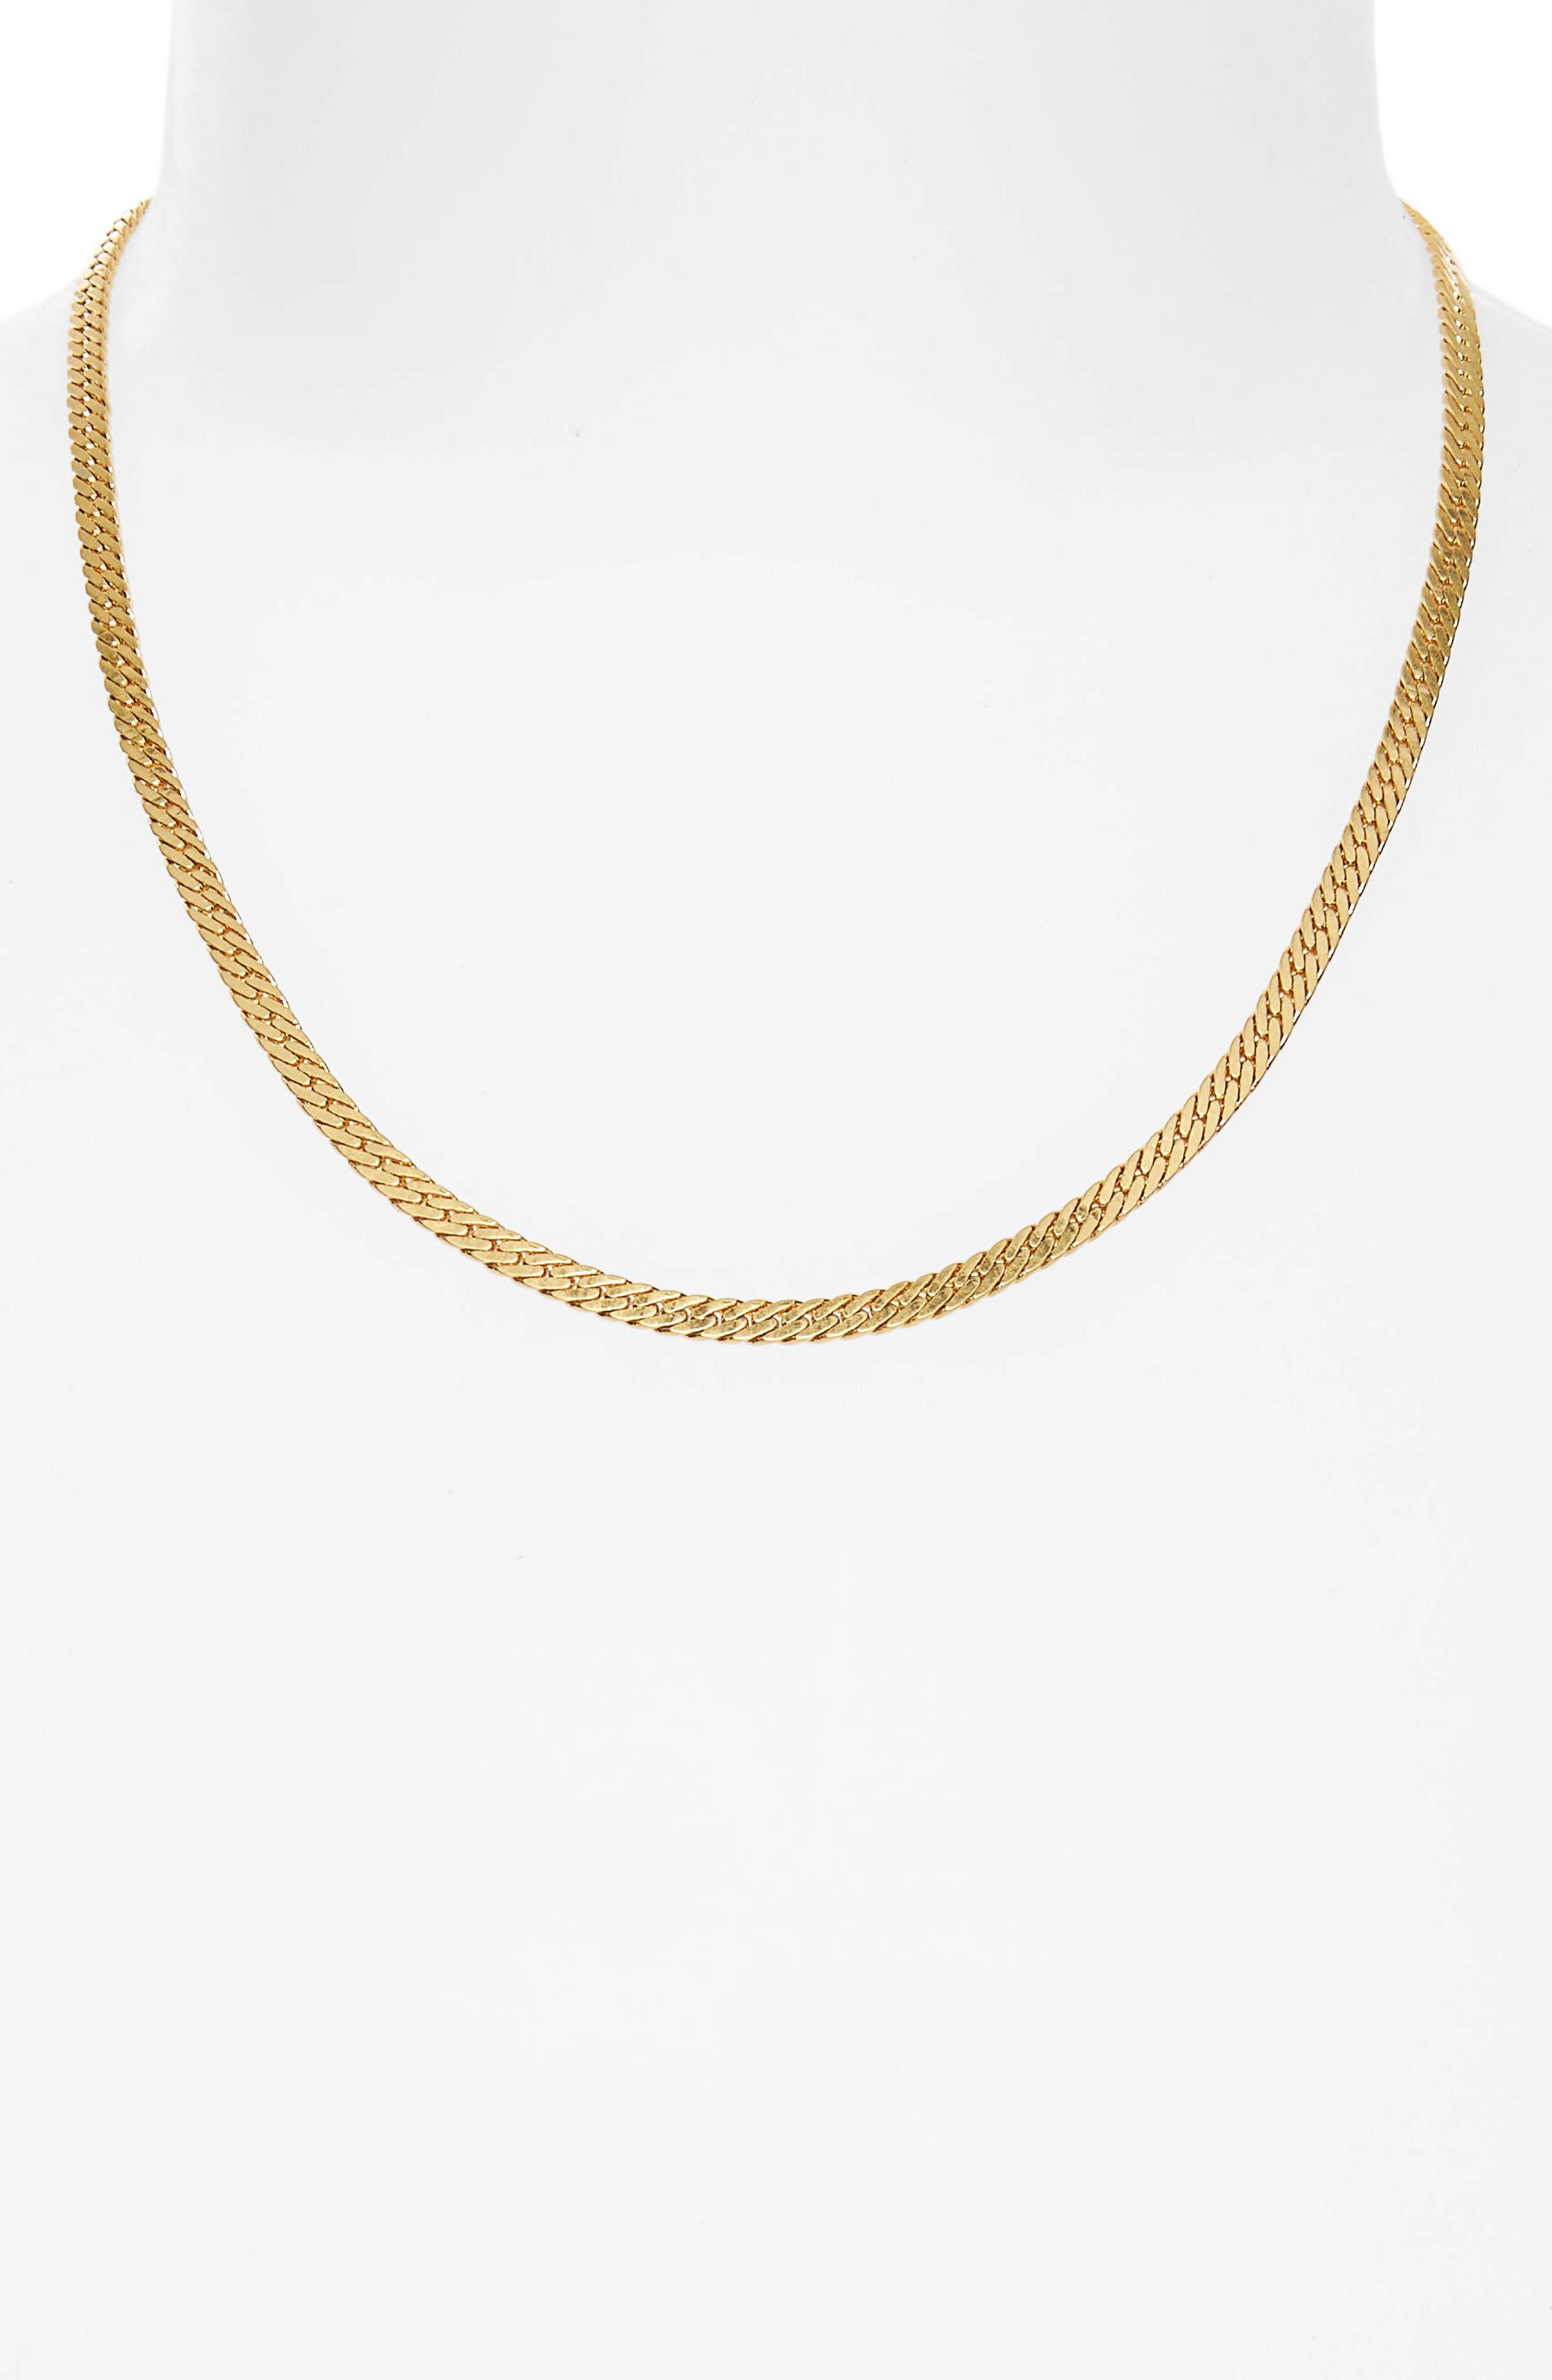 Simple Chain Necklace,                             Alternate thumbnail 2, color,                             VINTAGE GOLD